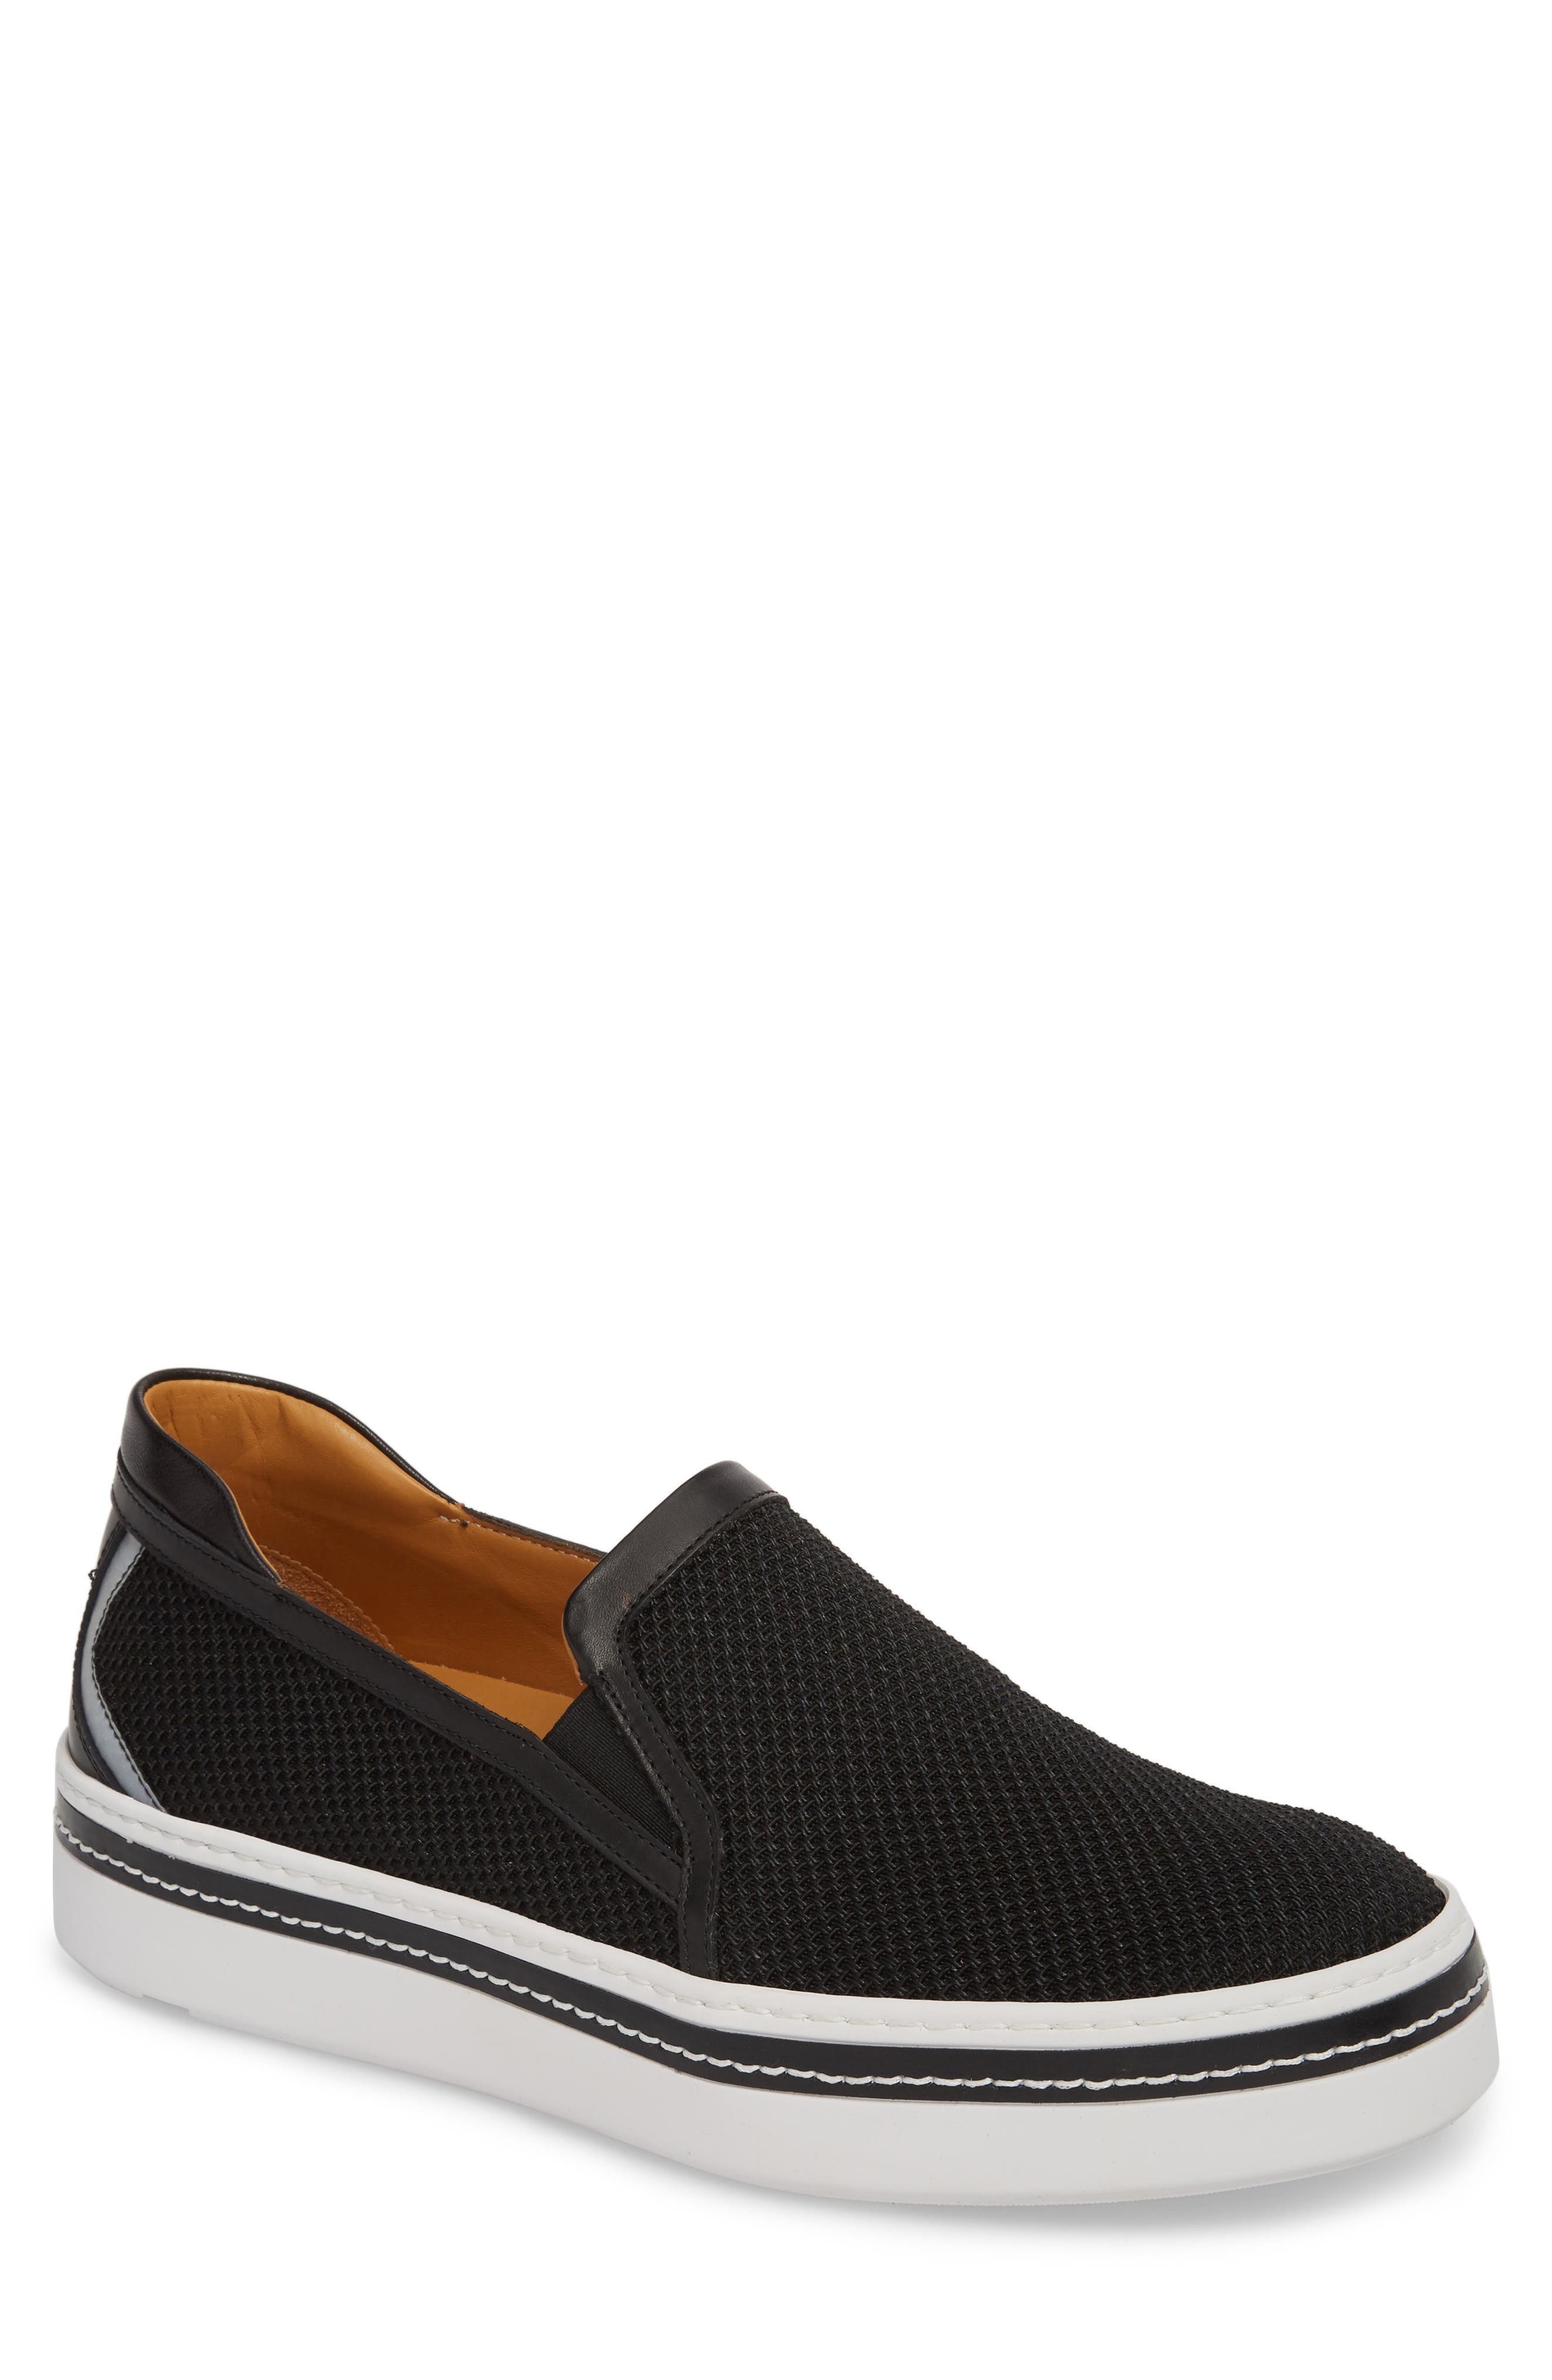 Sal Mesh Slip-On Sneaker,                             Main thumbnail 1, color,                             005